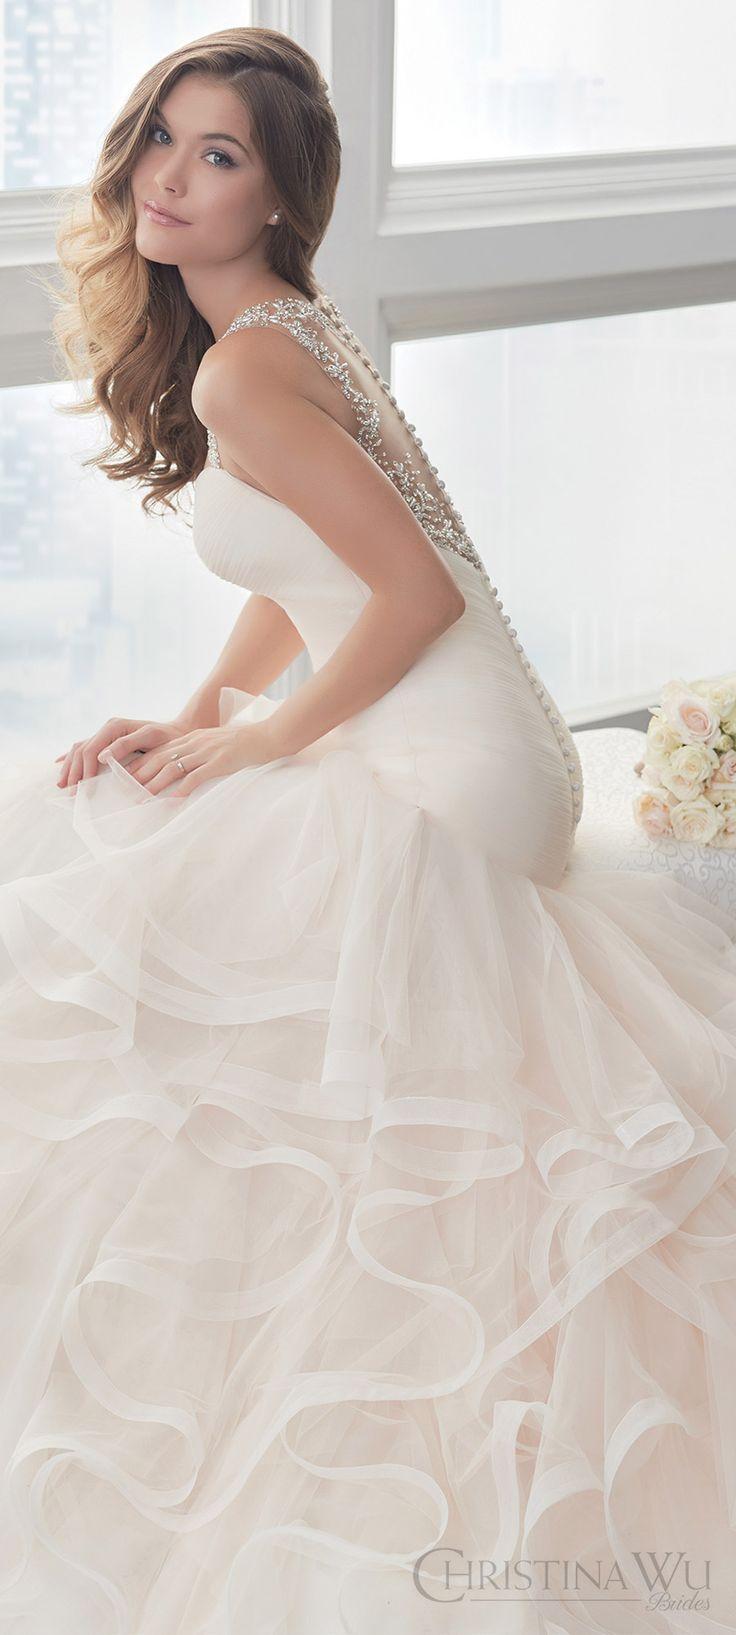 christina wu brides spring 2017 bridal sleeveless beaded straps sweetheart ruffle skirt mermaid wedding dress (15631) mv blush color